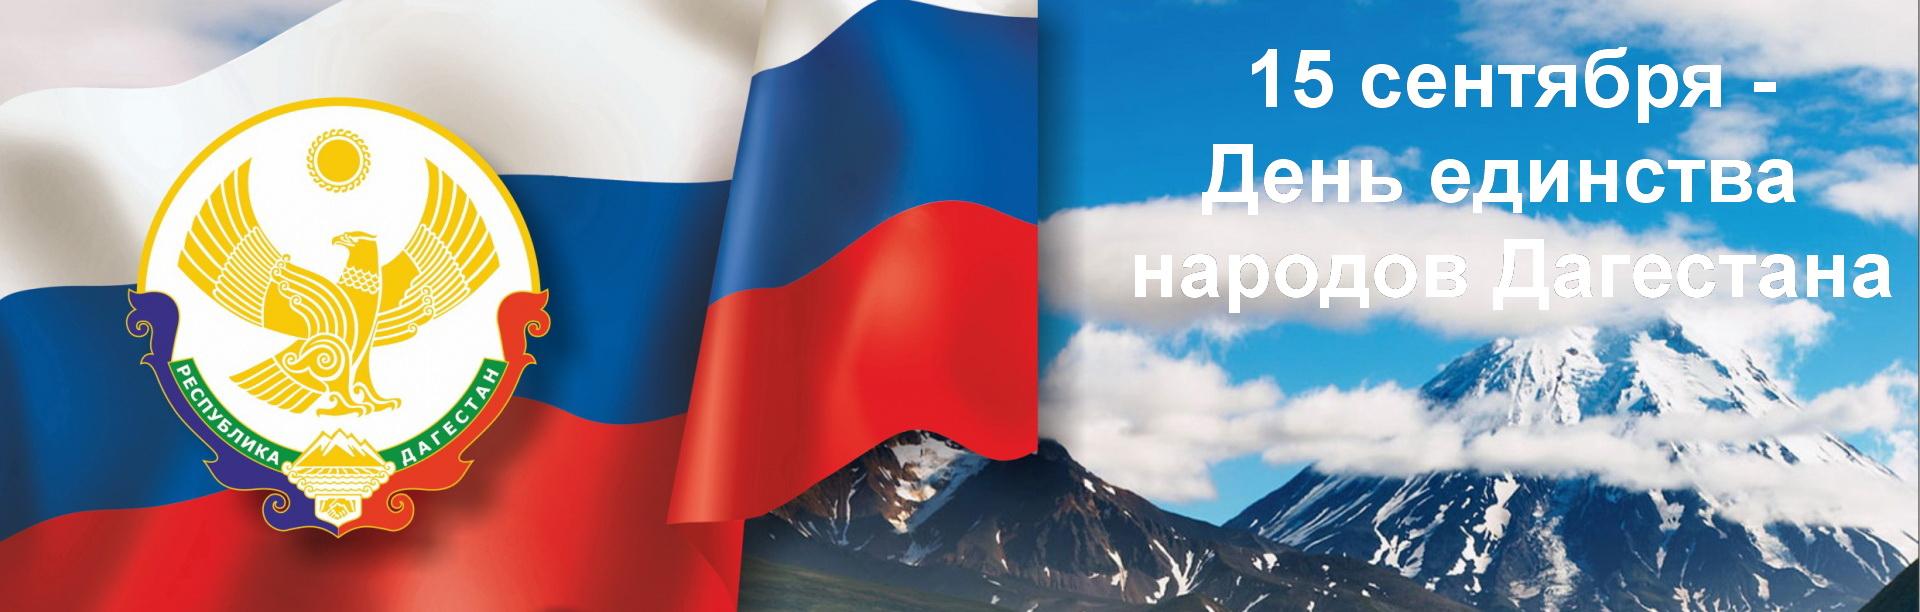 Картинки по запросу с днем единства народов дагестана